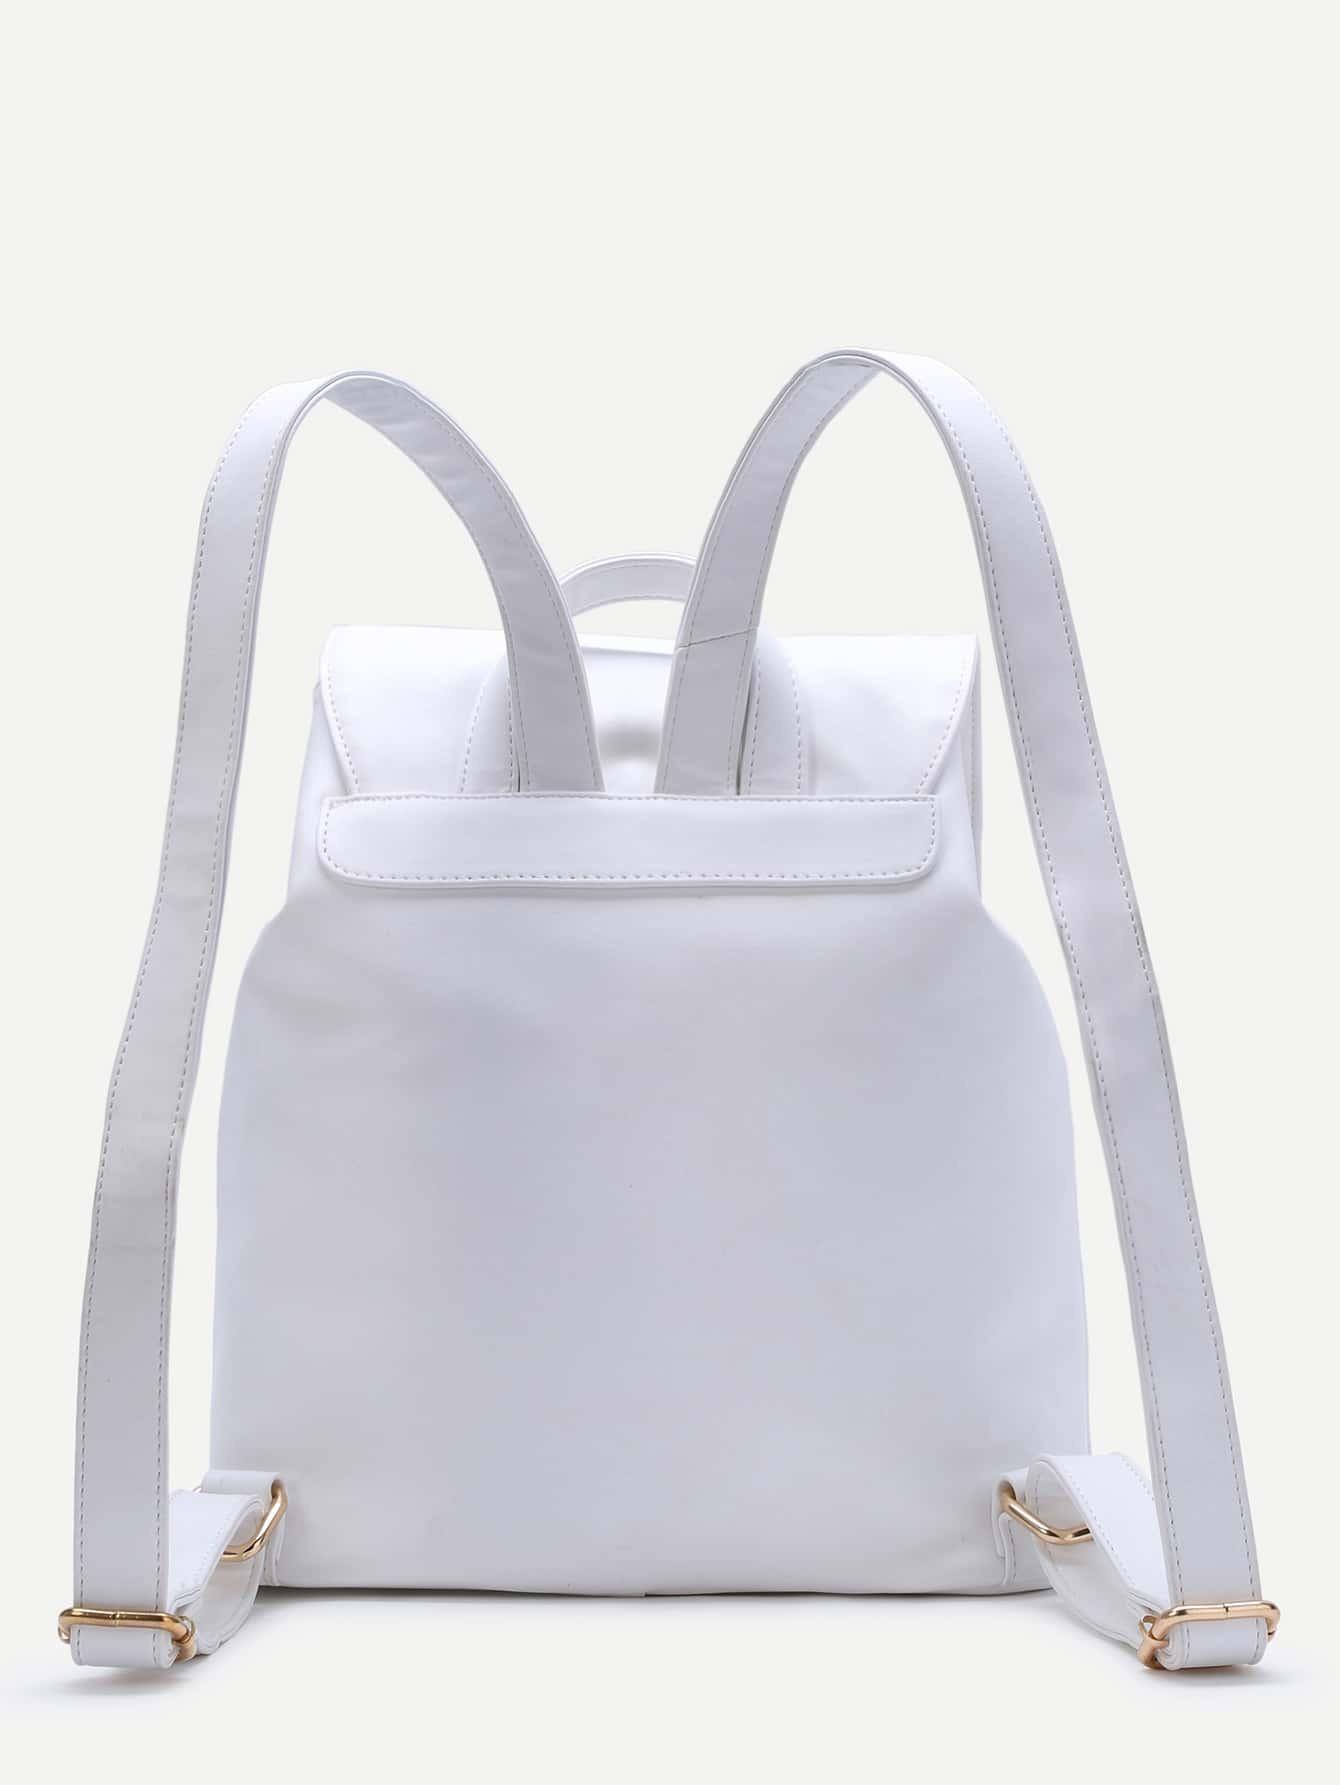 bag170104902_2